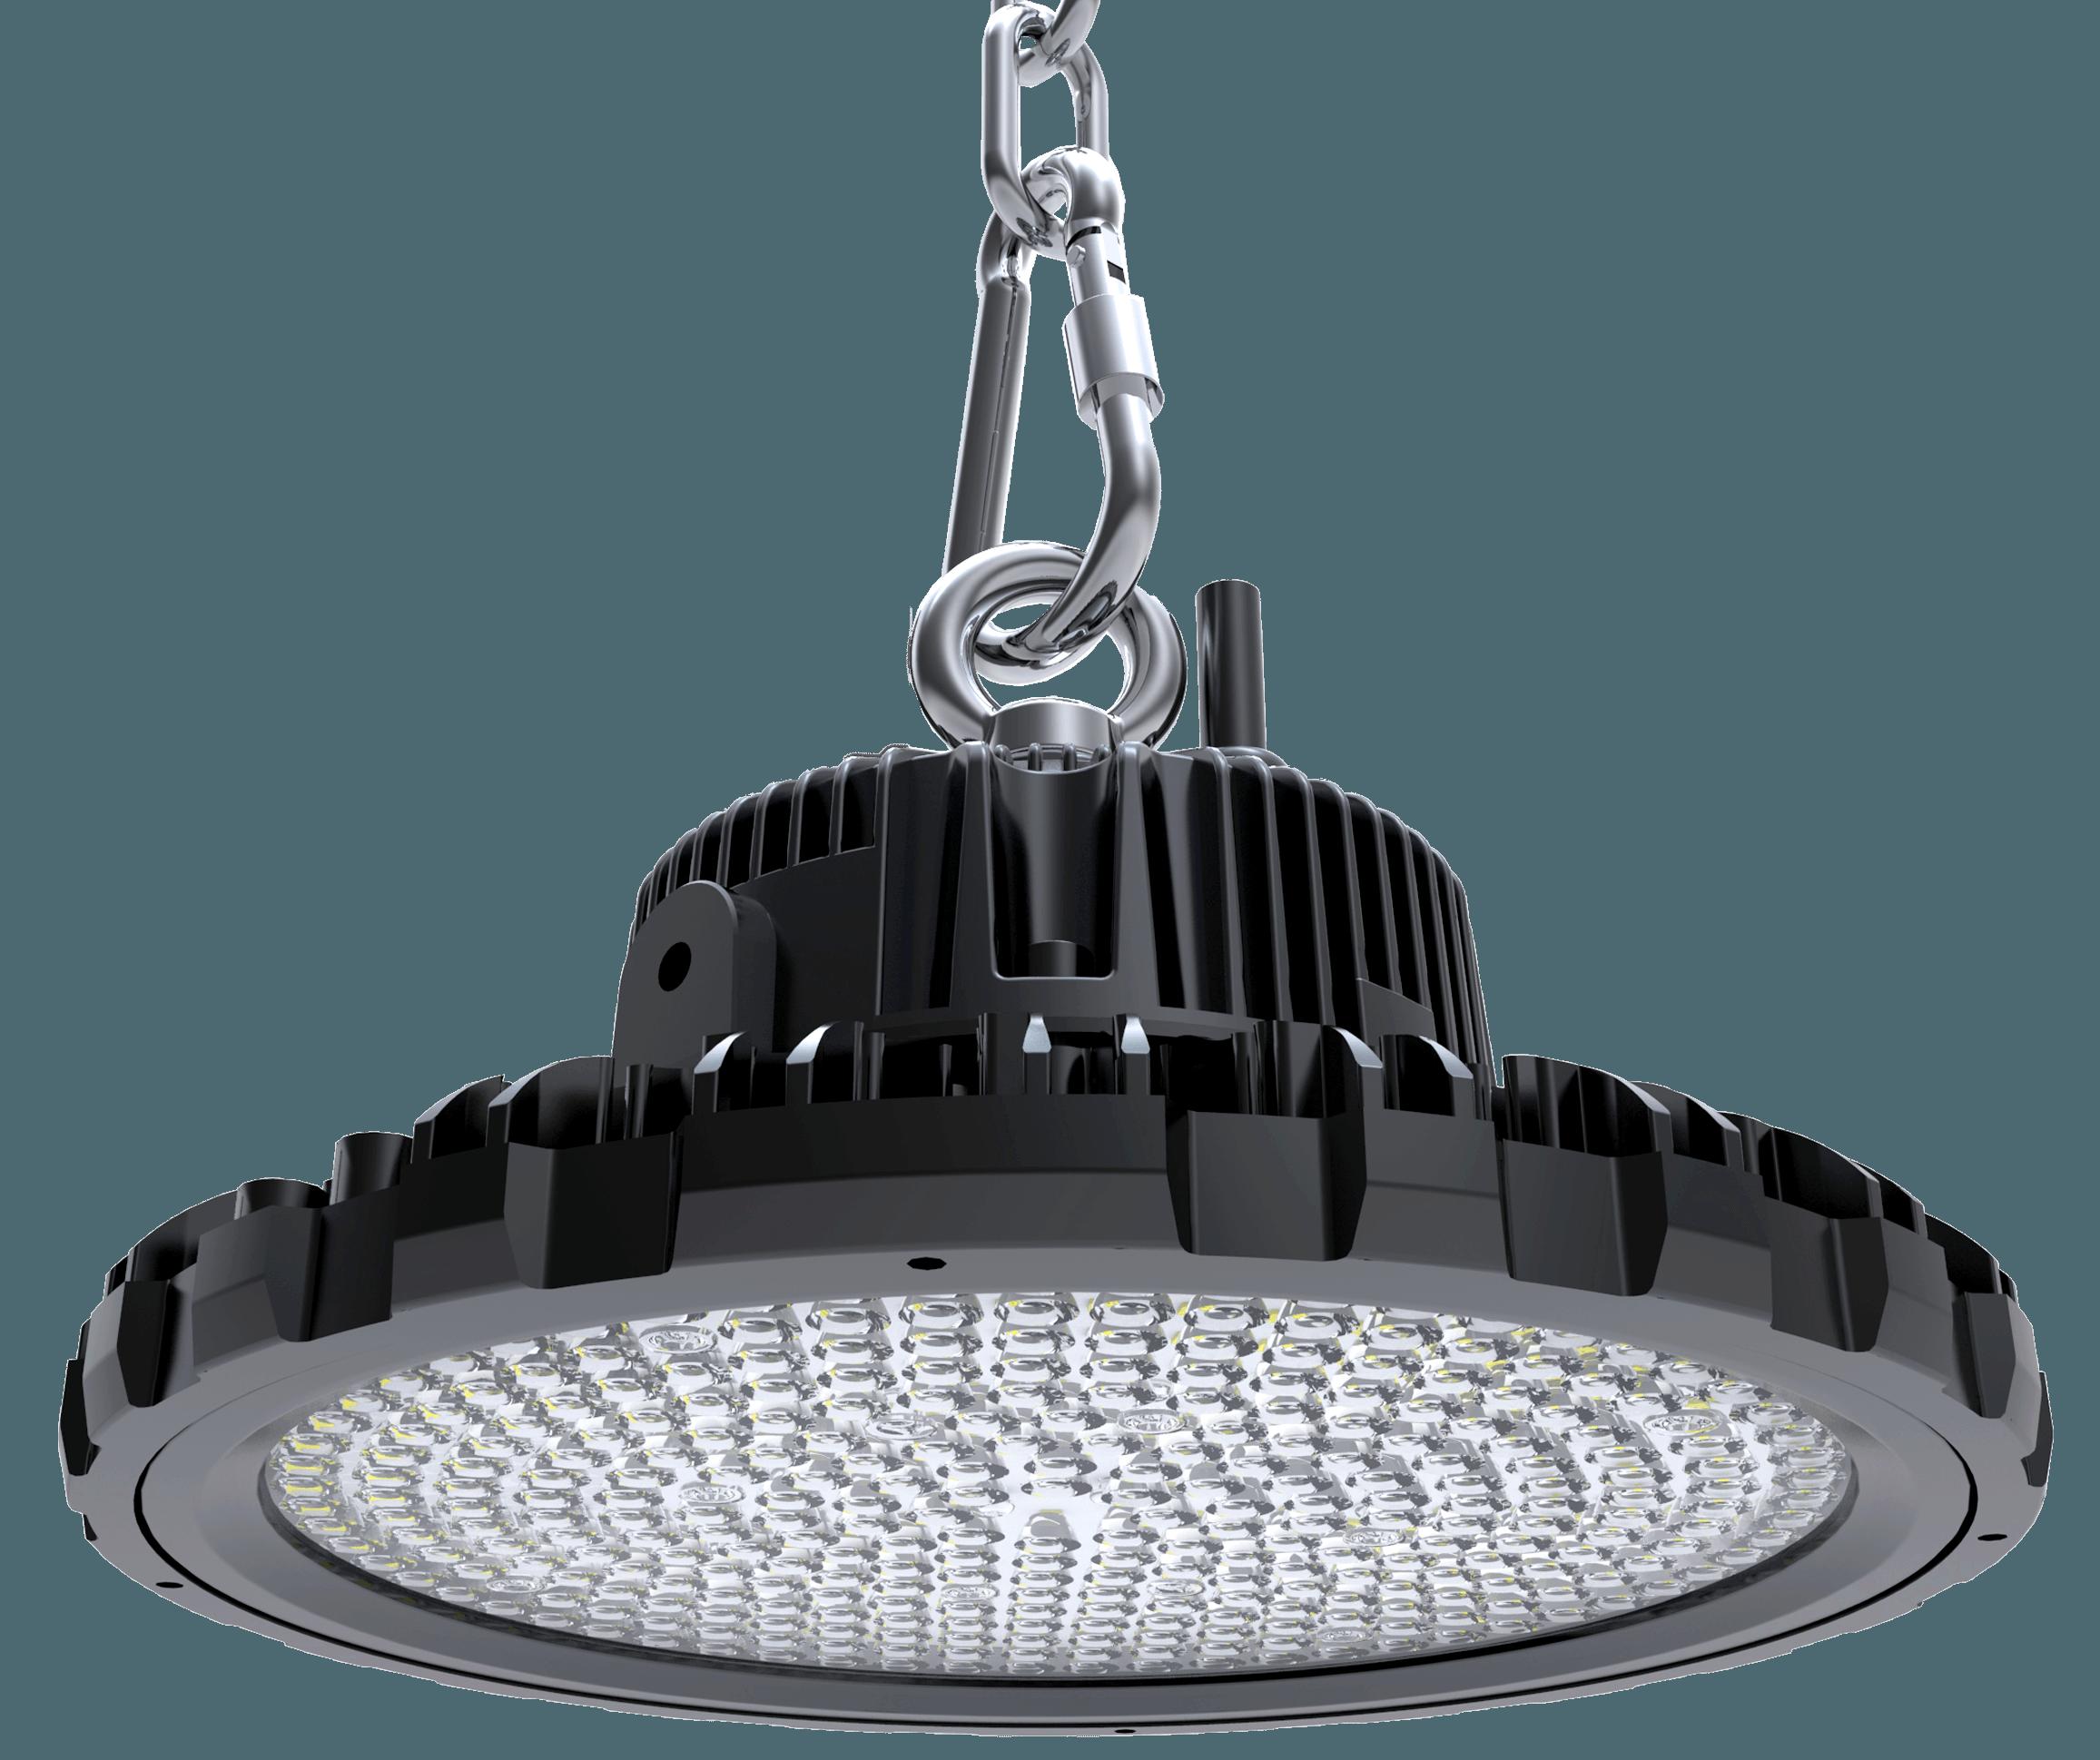 UFO LED HighBay Light 100W 135Lmw, IP65 Waterproof